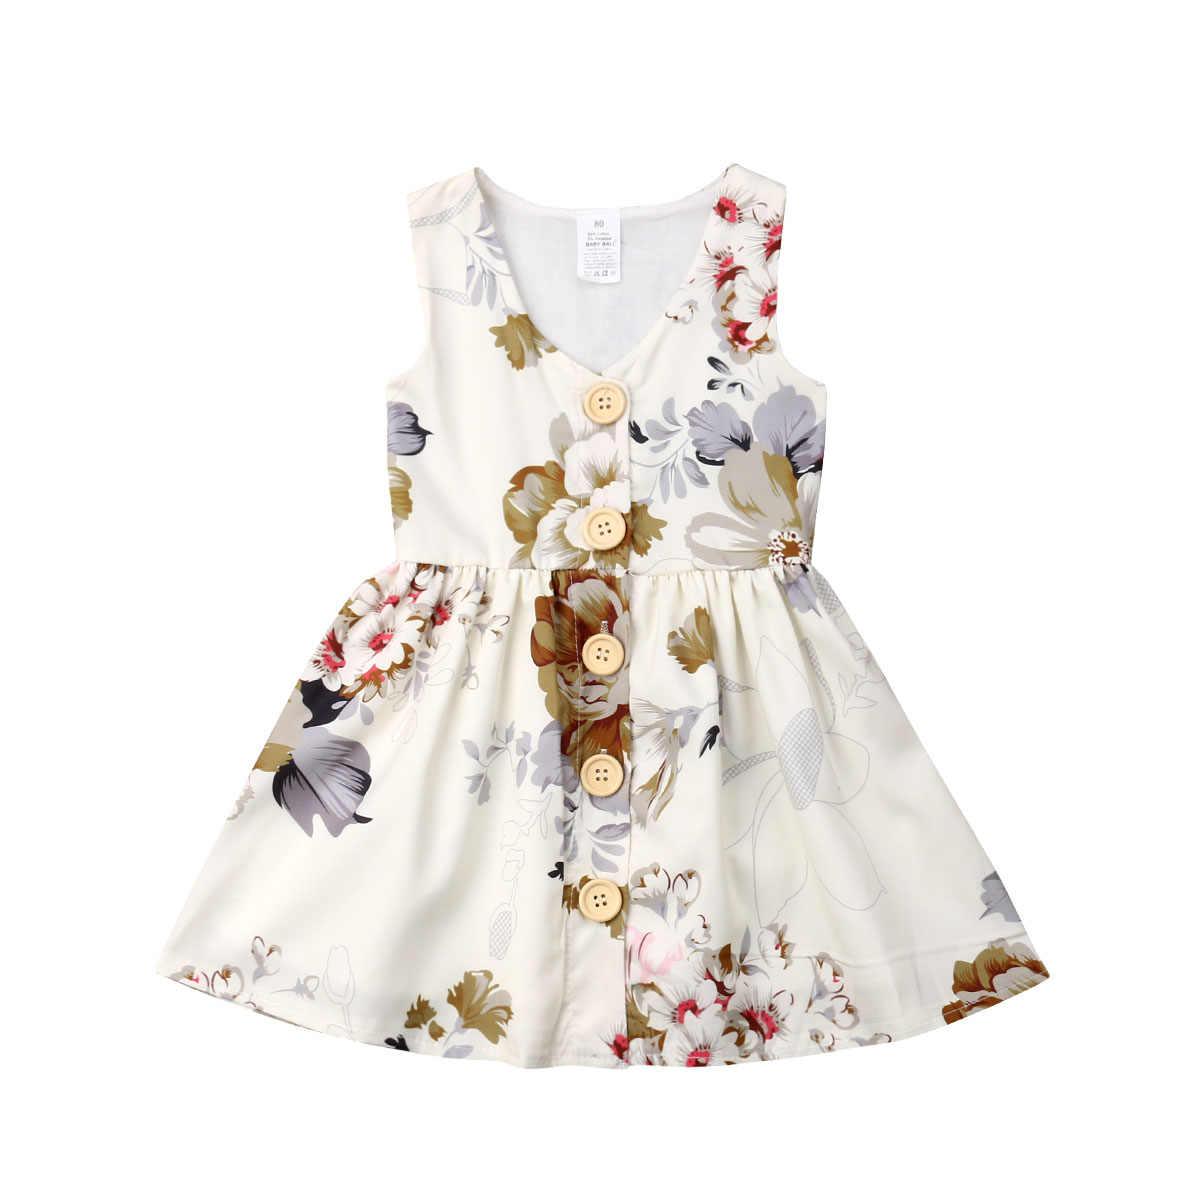 0b8f0c8f3b 6M-5Y Children Girls Dress 2019 Summer Sleeveless Button V-neck Floral  Bobho Sundress